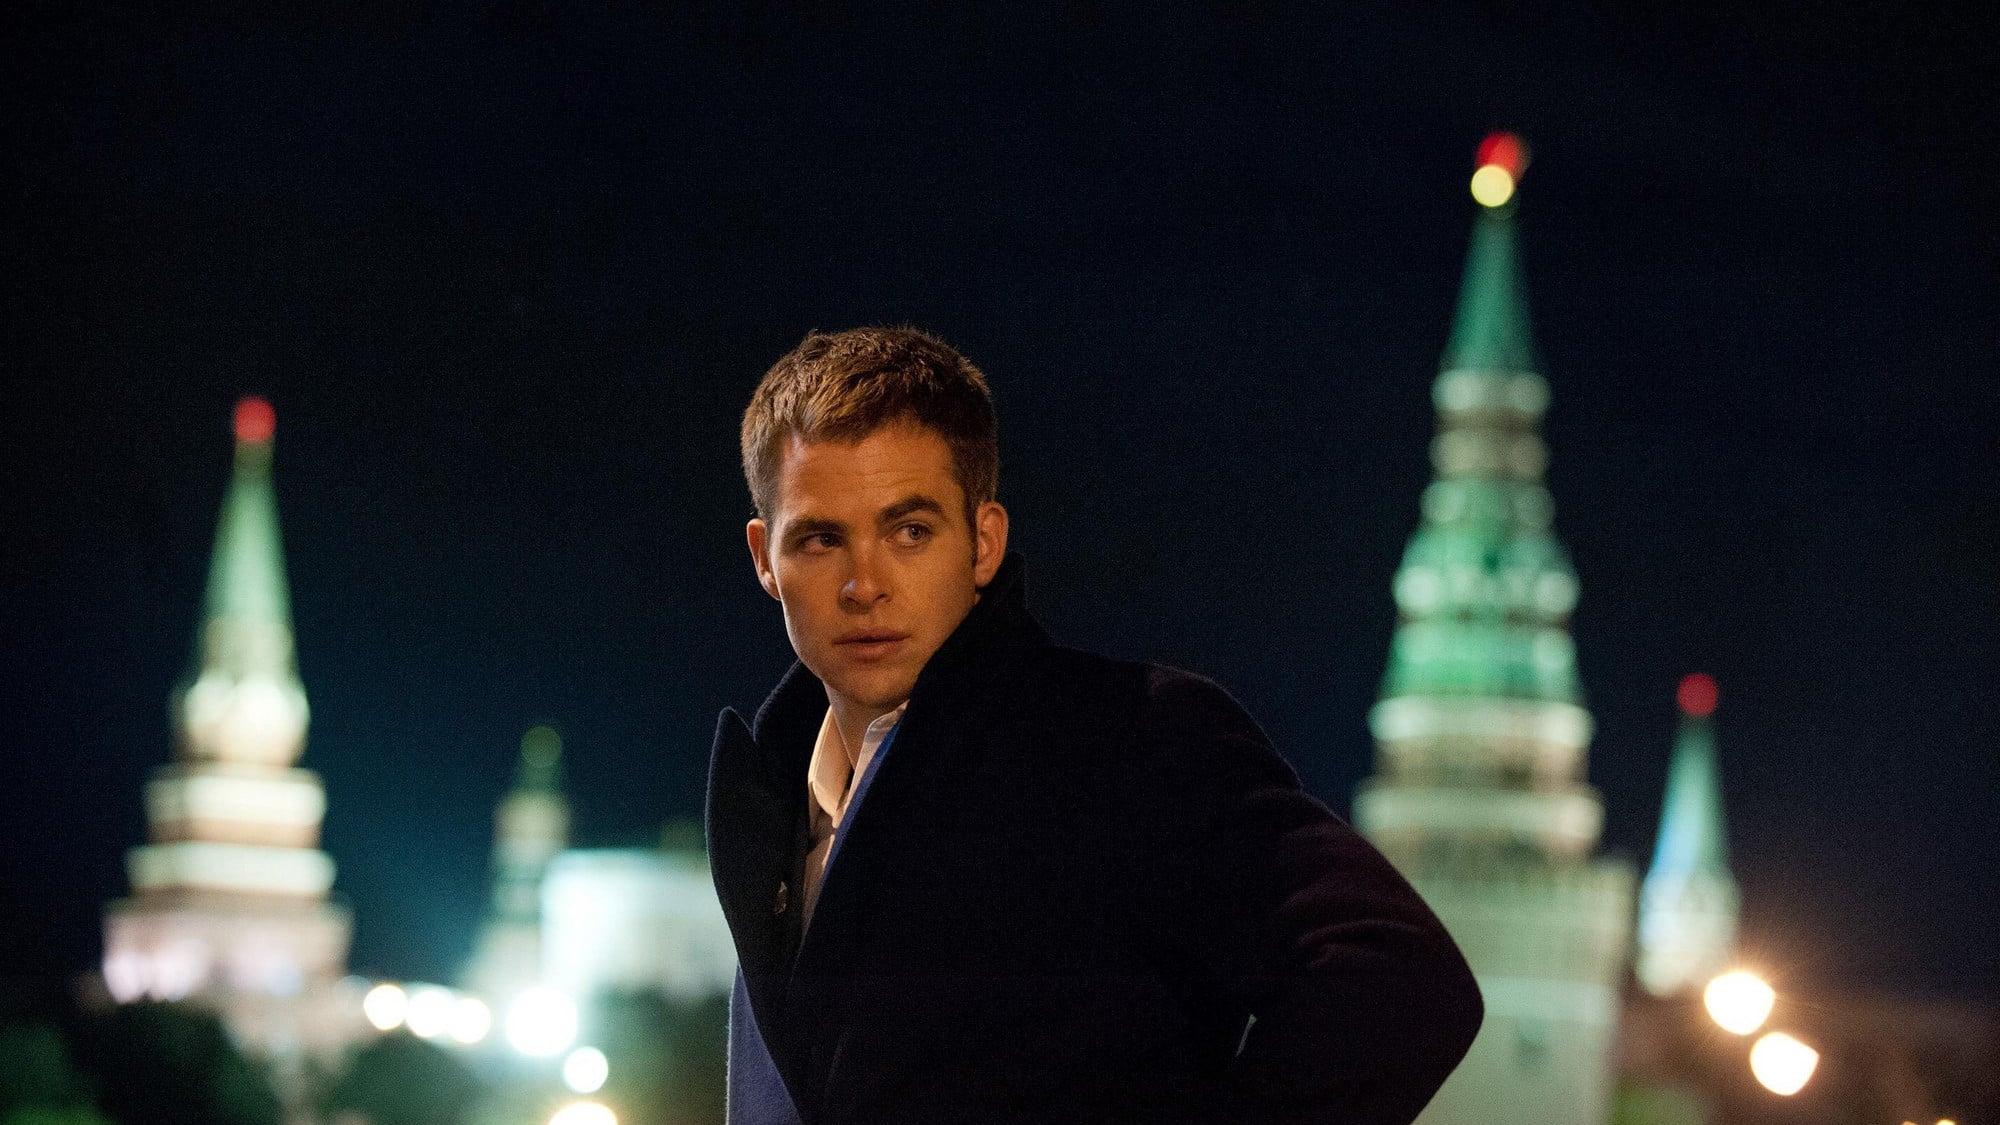 Jack Ryan: Shadow Recruit backdrop